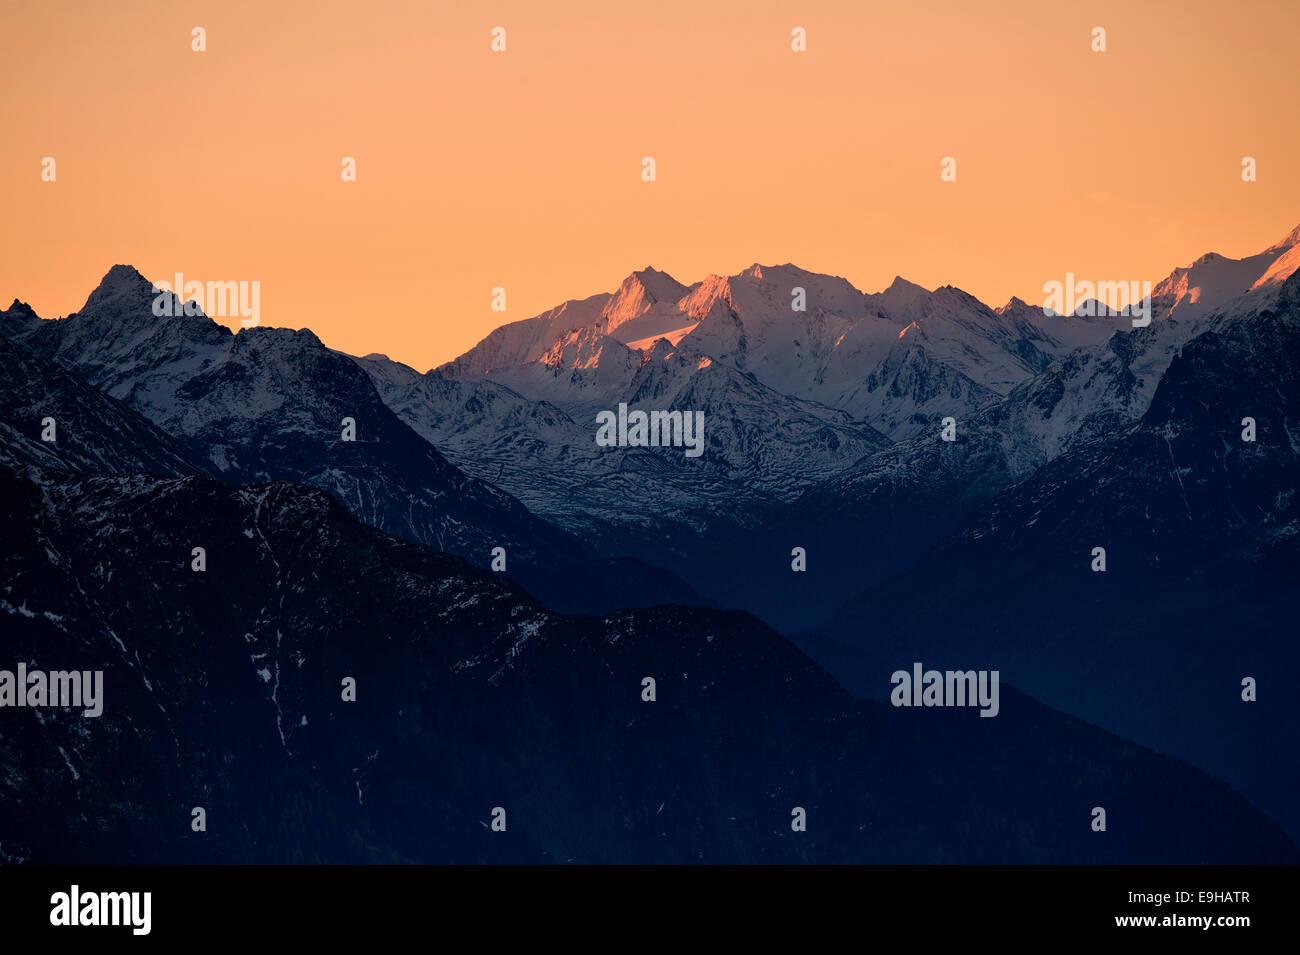 Sun rise over the mountains, Ehrwald, Tyrol, Austria - Stock Image